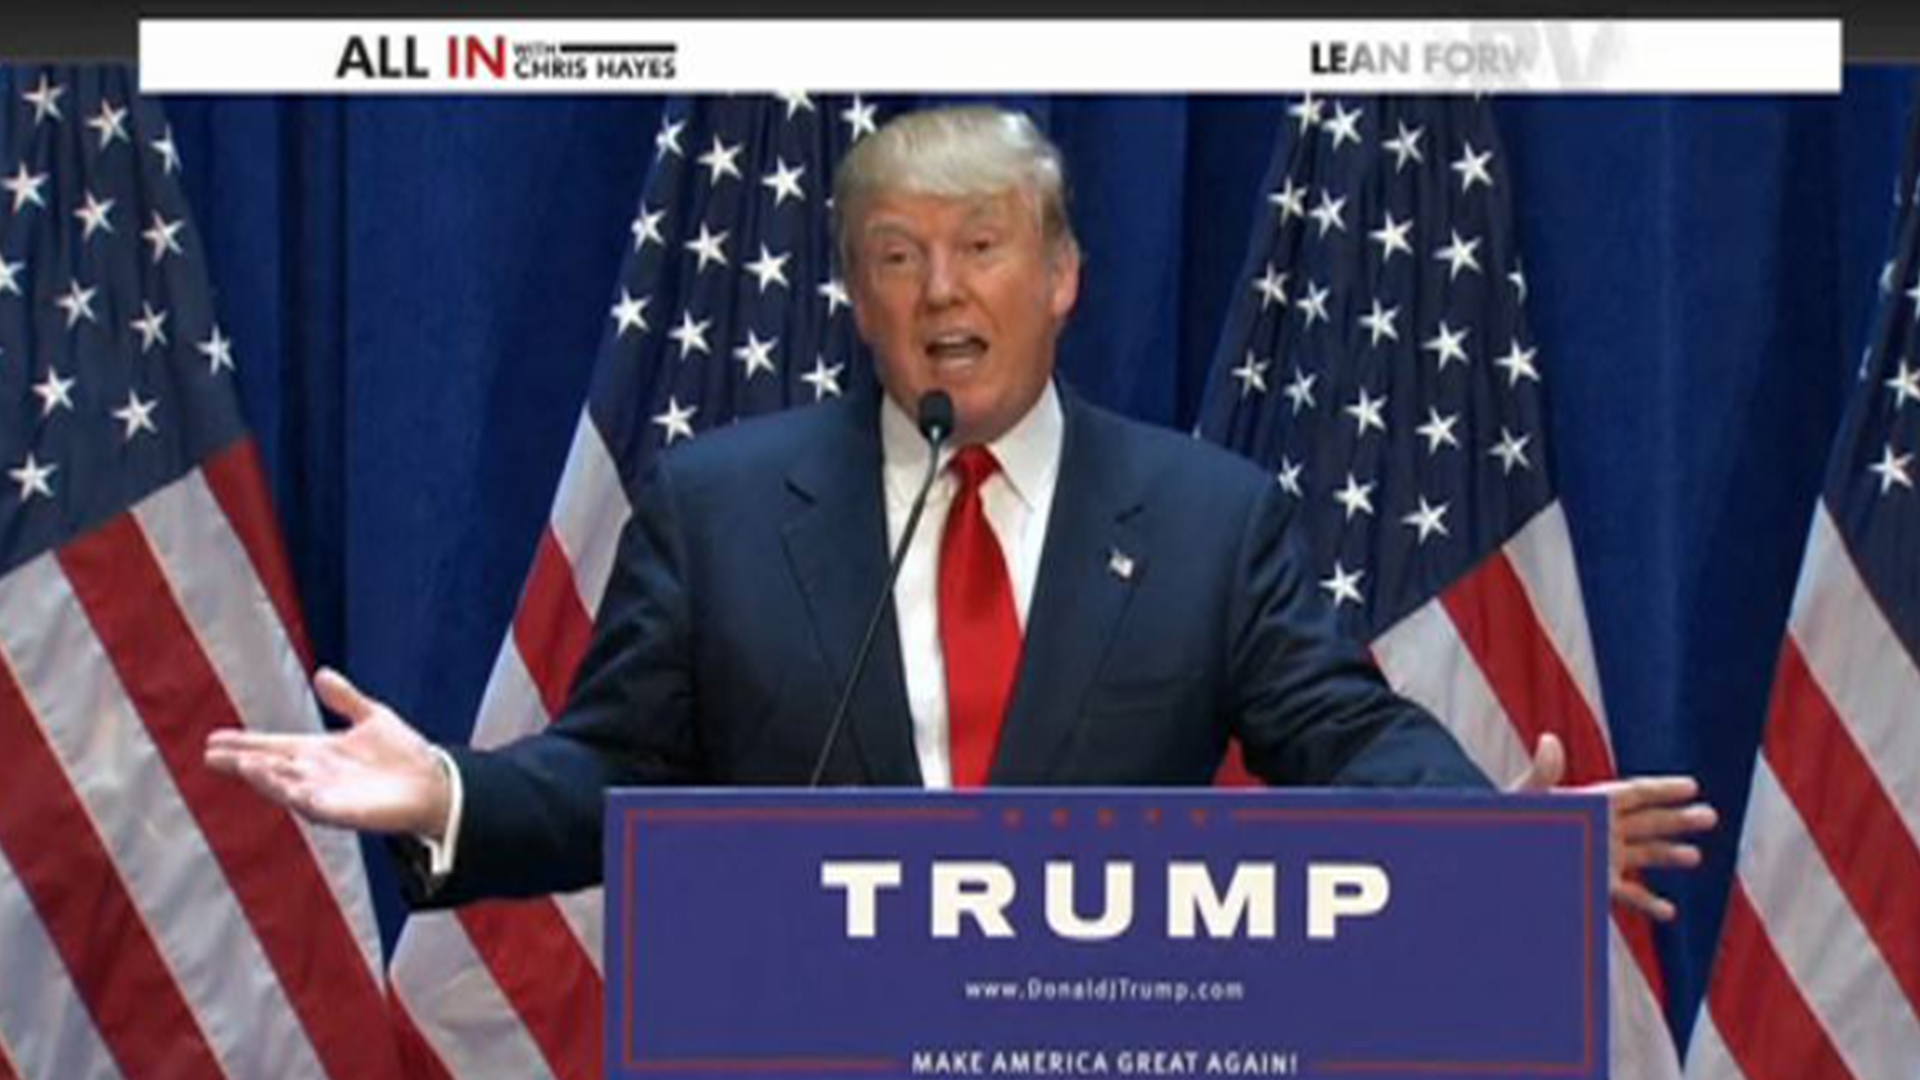 The 'best' of Donald Trump's big speech